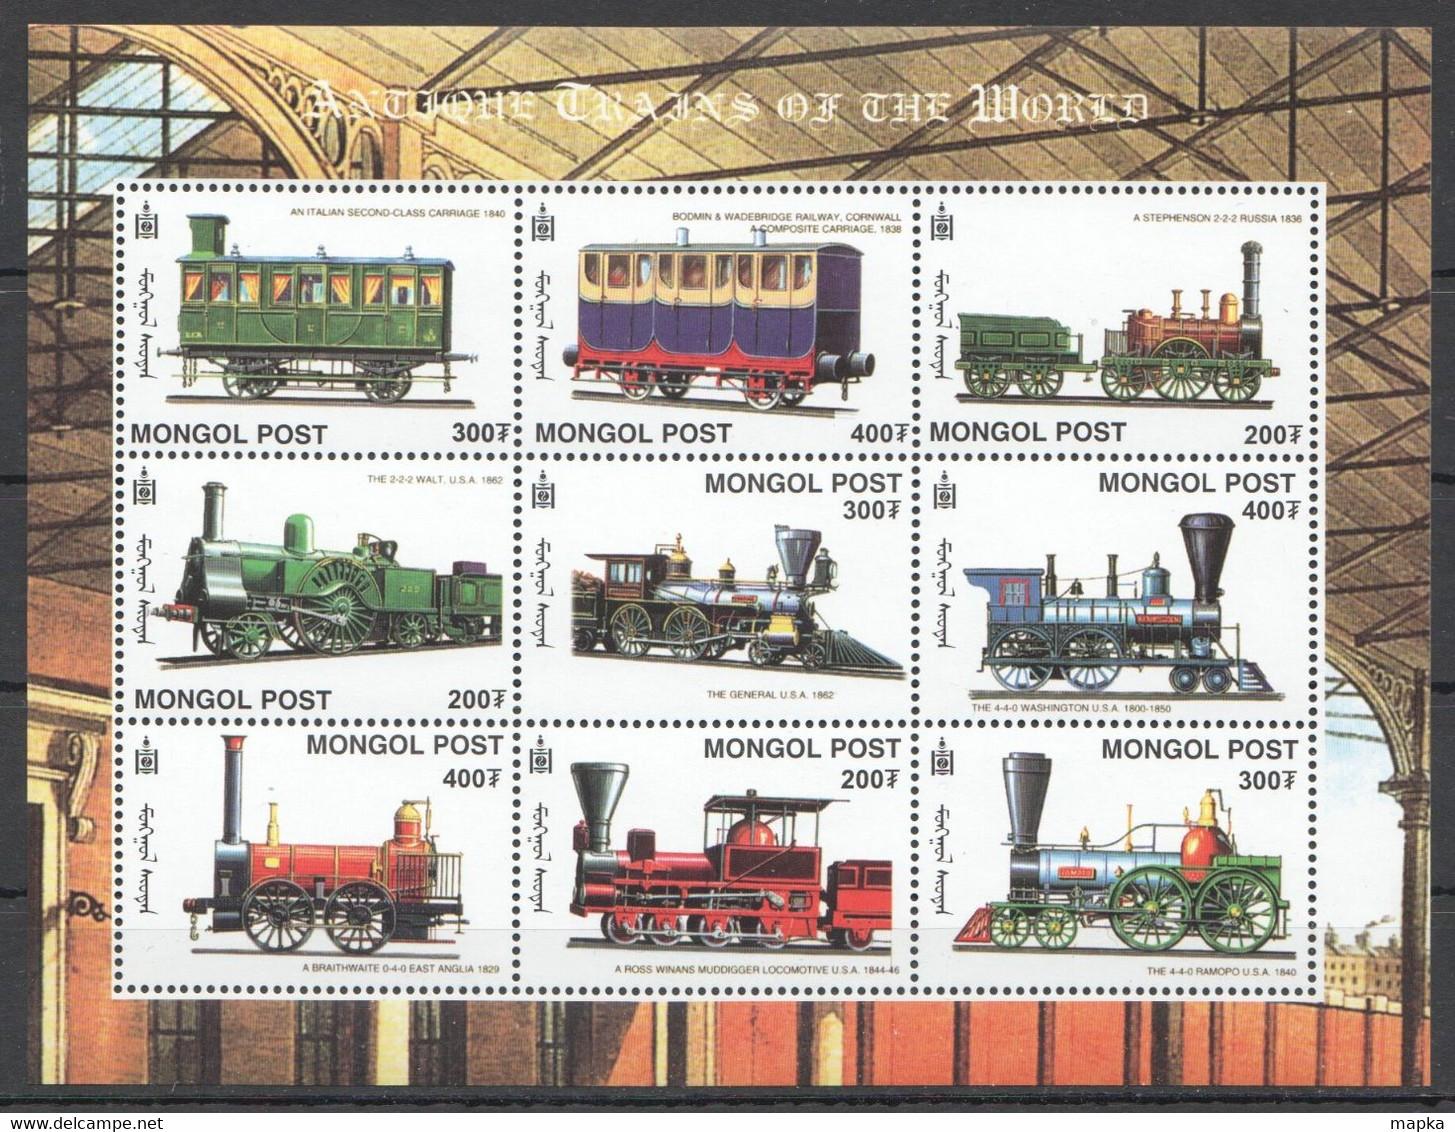 VV403 MONGOL POST ANTIQUE TRAINS OF THE WORLD 1KB MNH - Trains